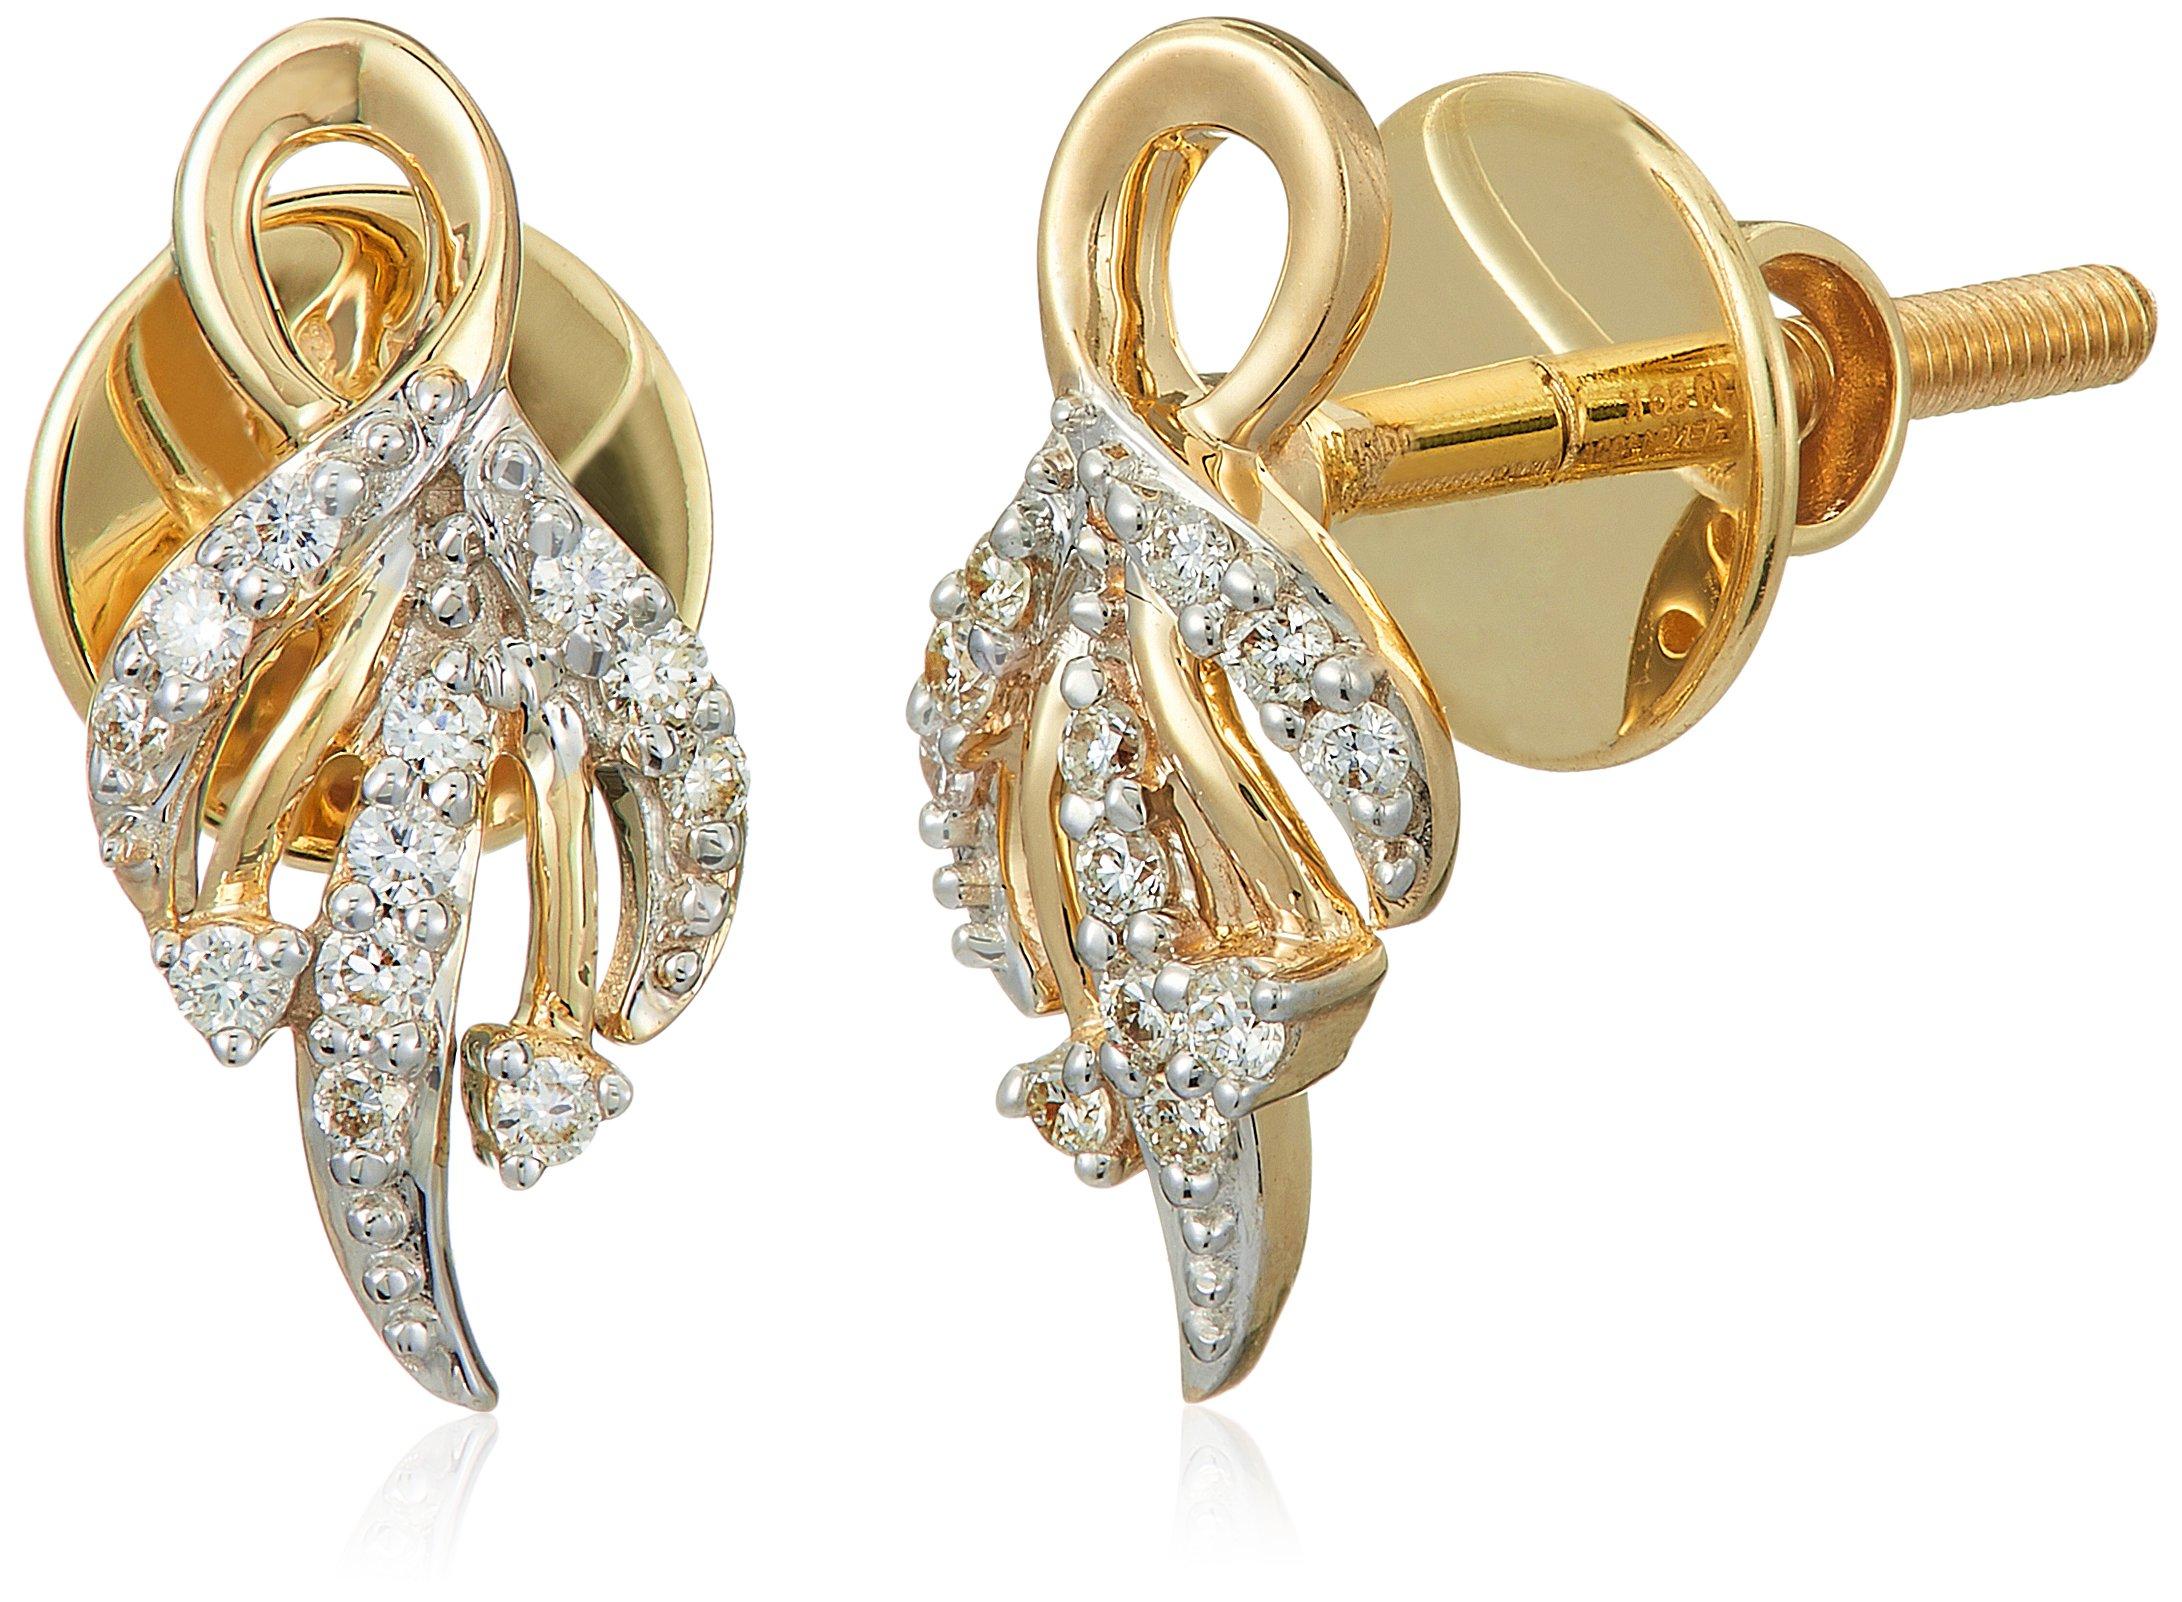 Senco Gold 14KT Yellow Gold and Diamond Stud Earrings for Women (DT-D000123777)